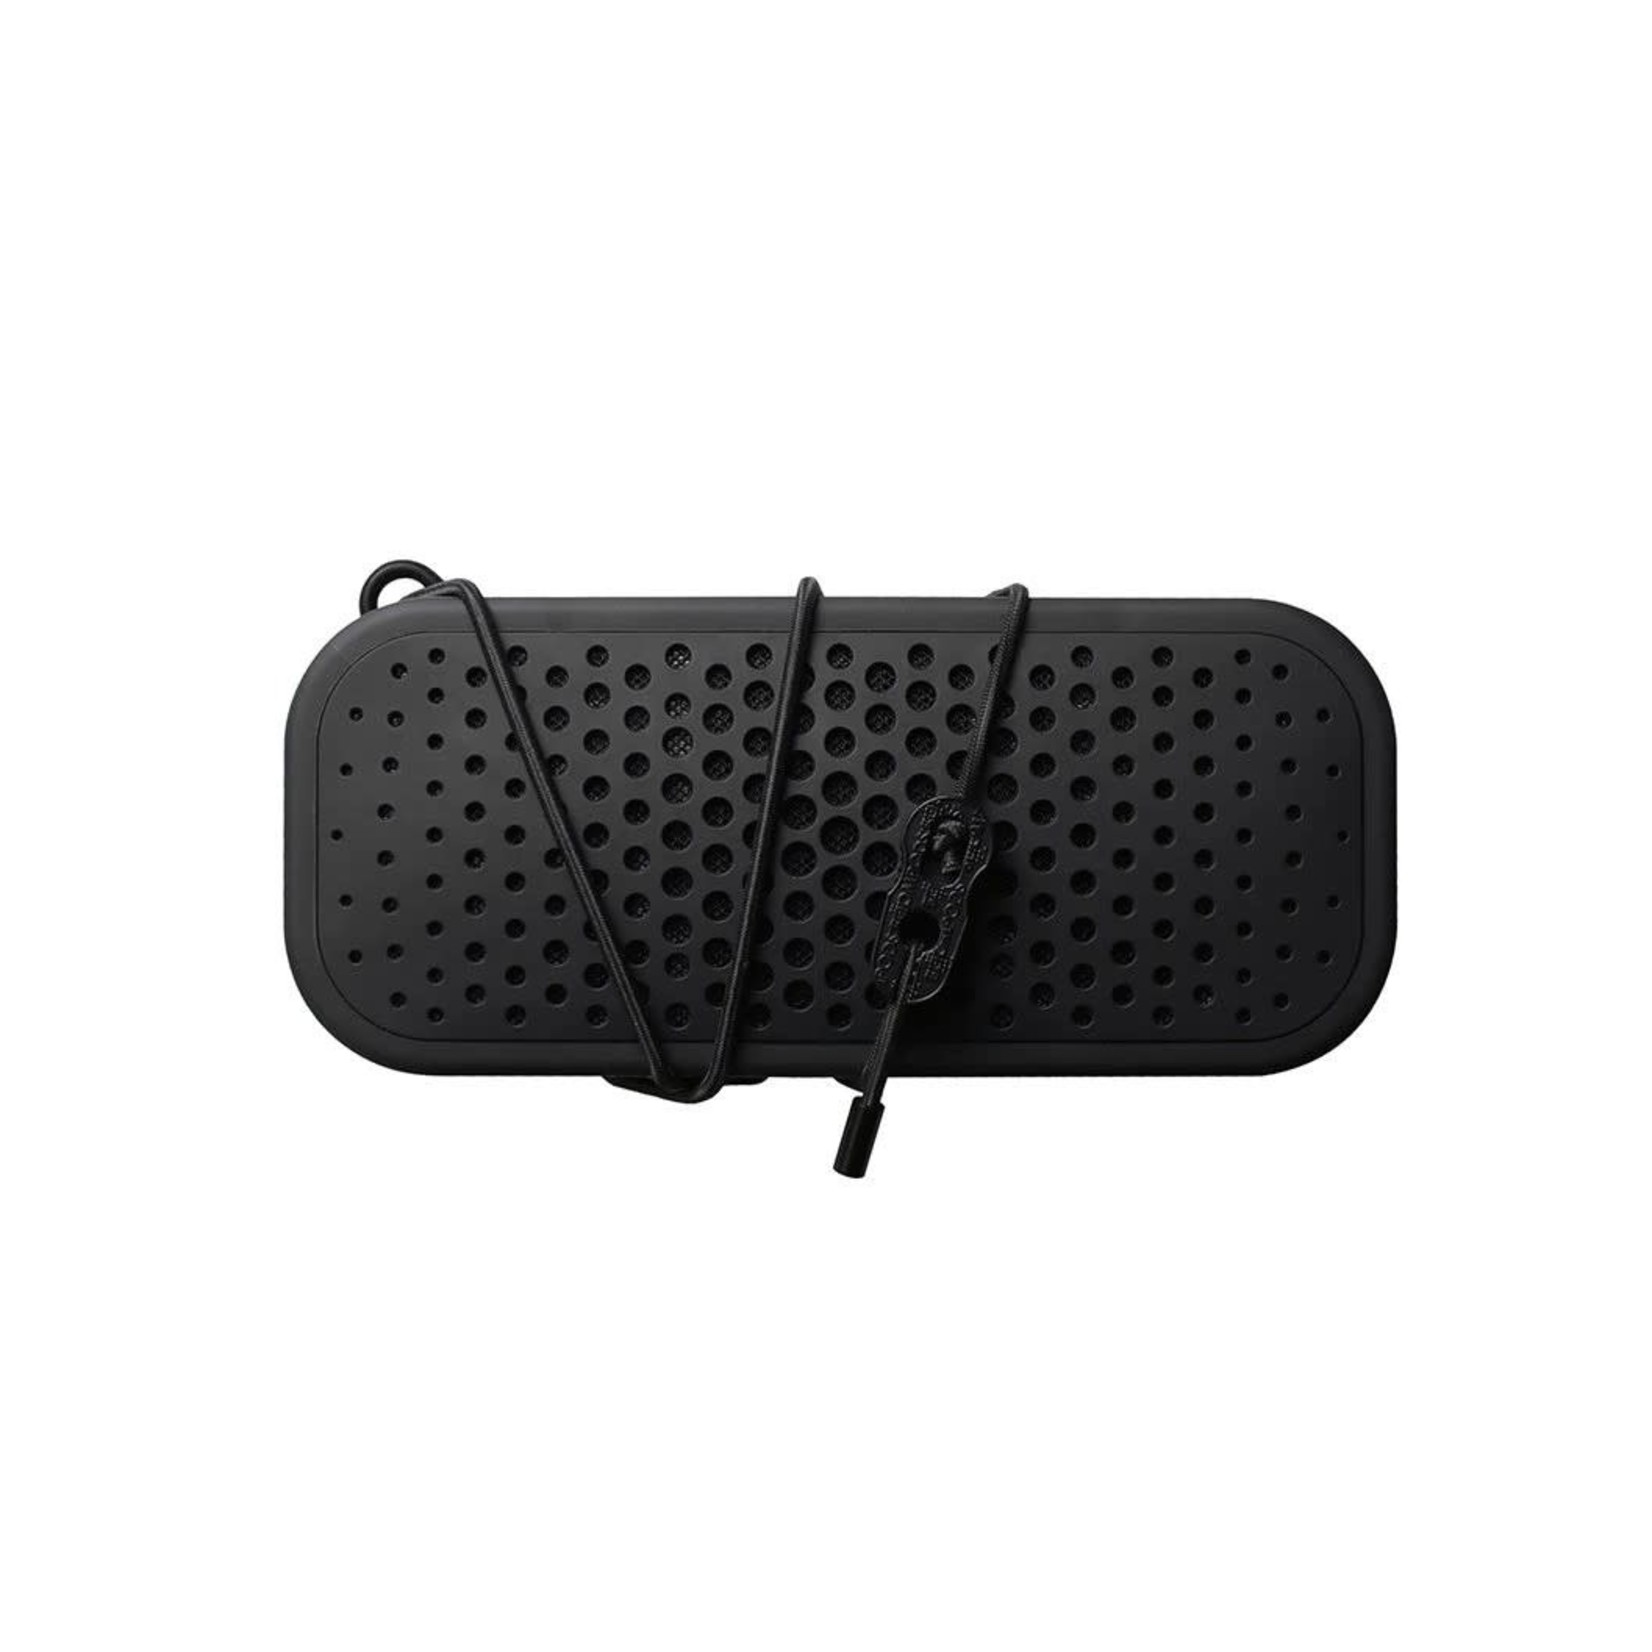 Boompods Blockblaster Bluetooth Speaker in Black